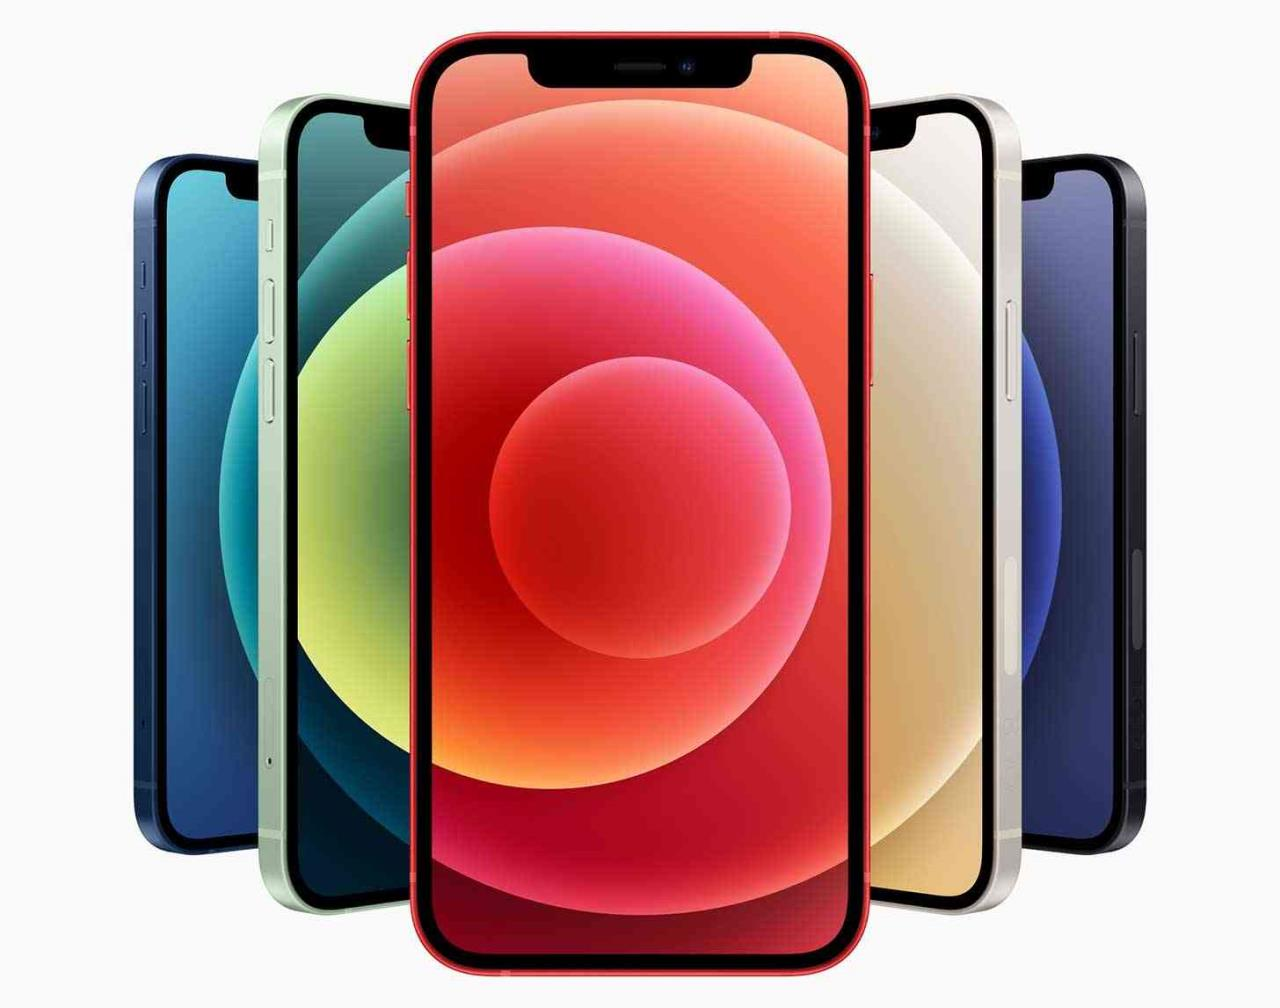 apple iphone 12 cores